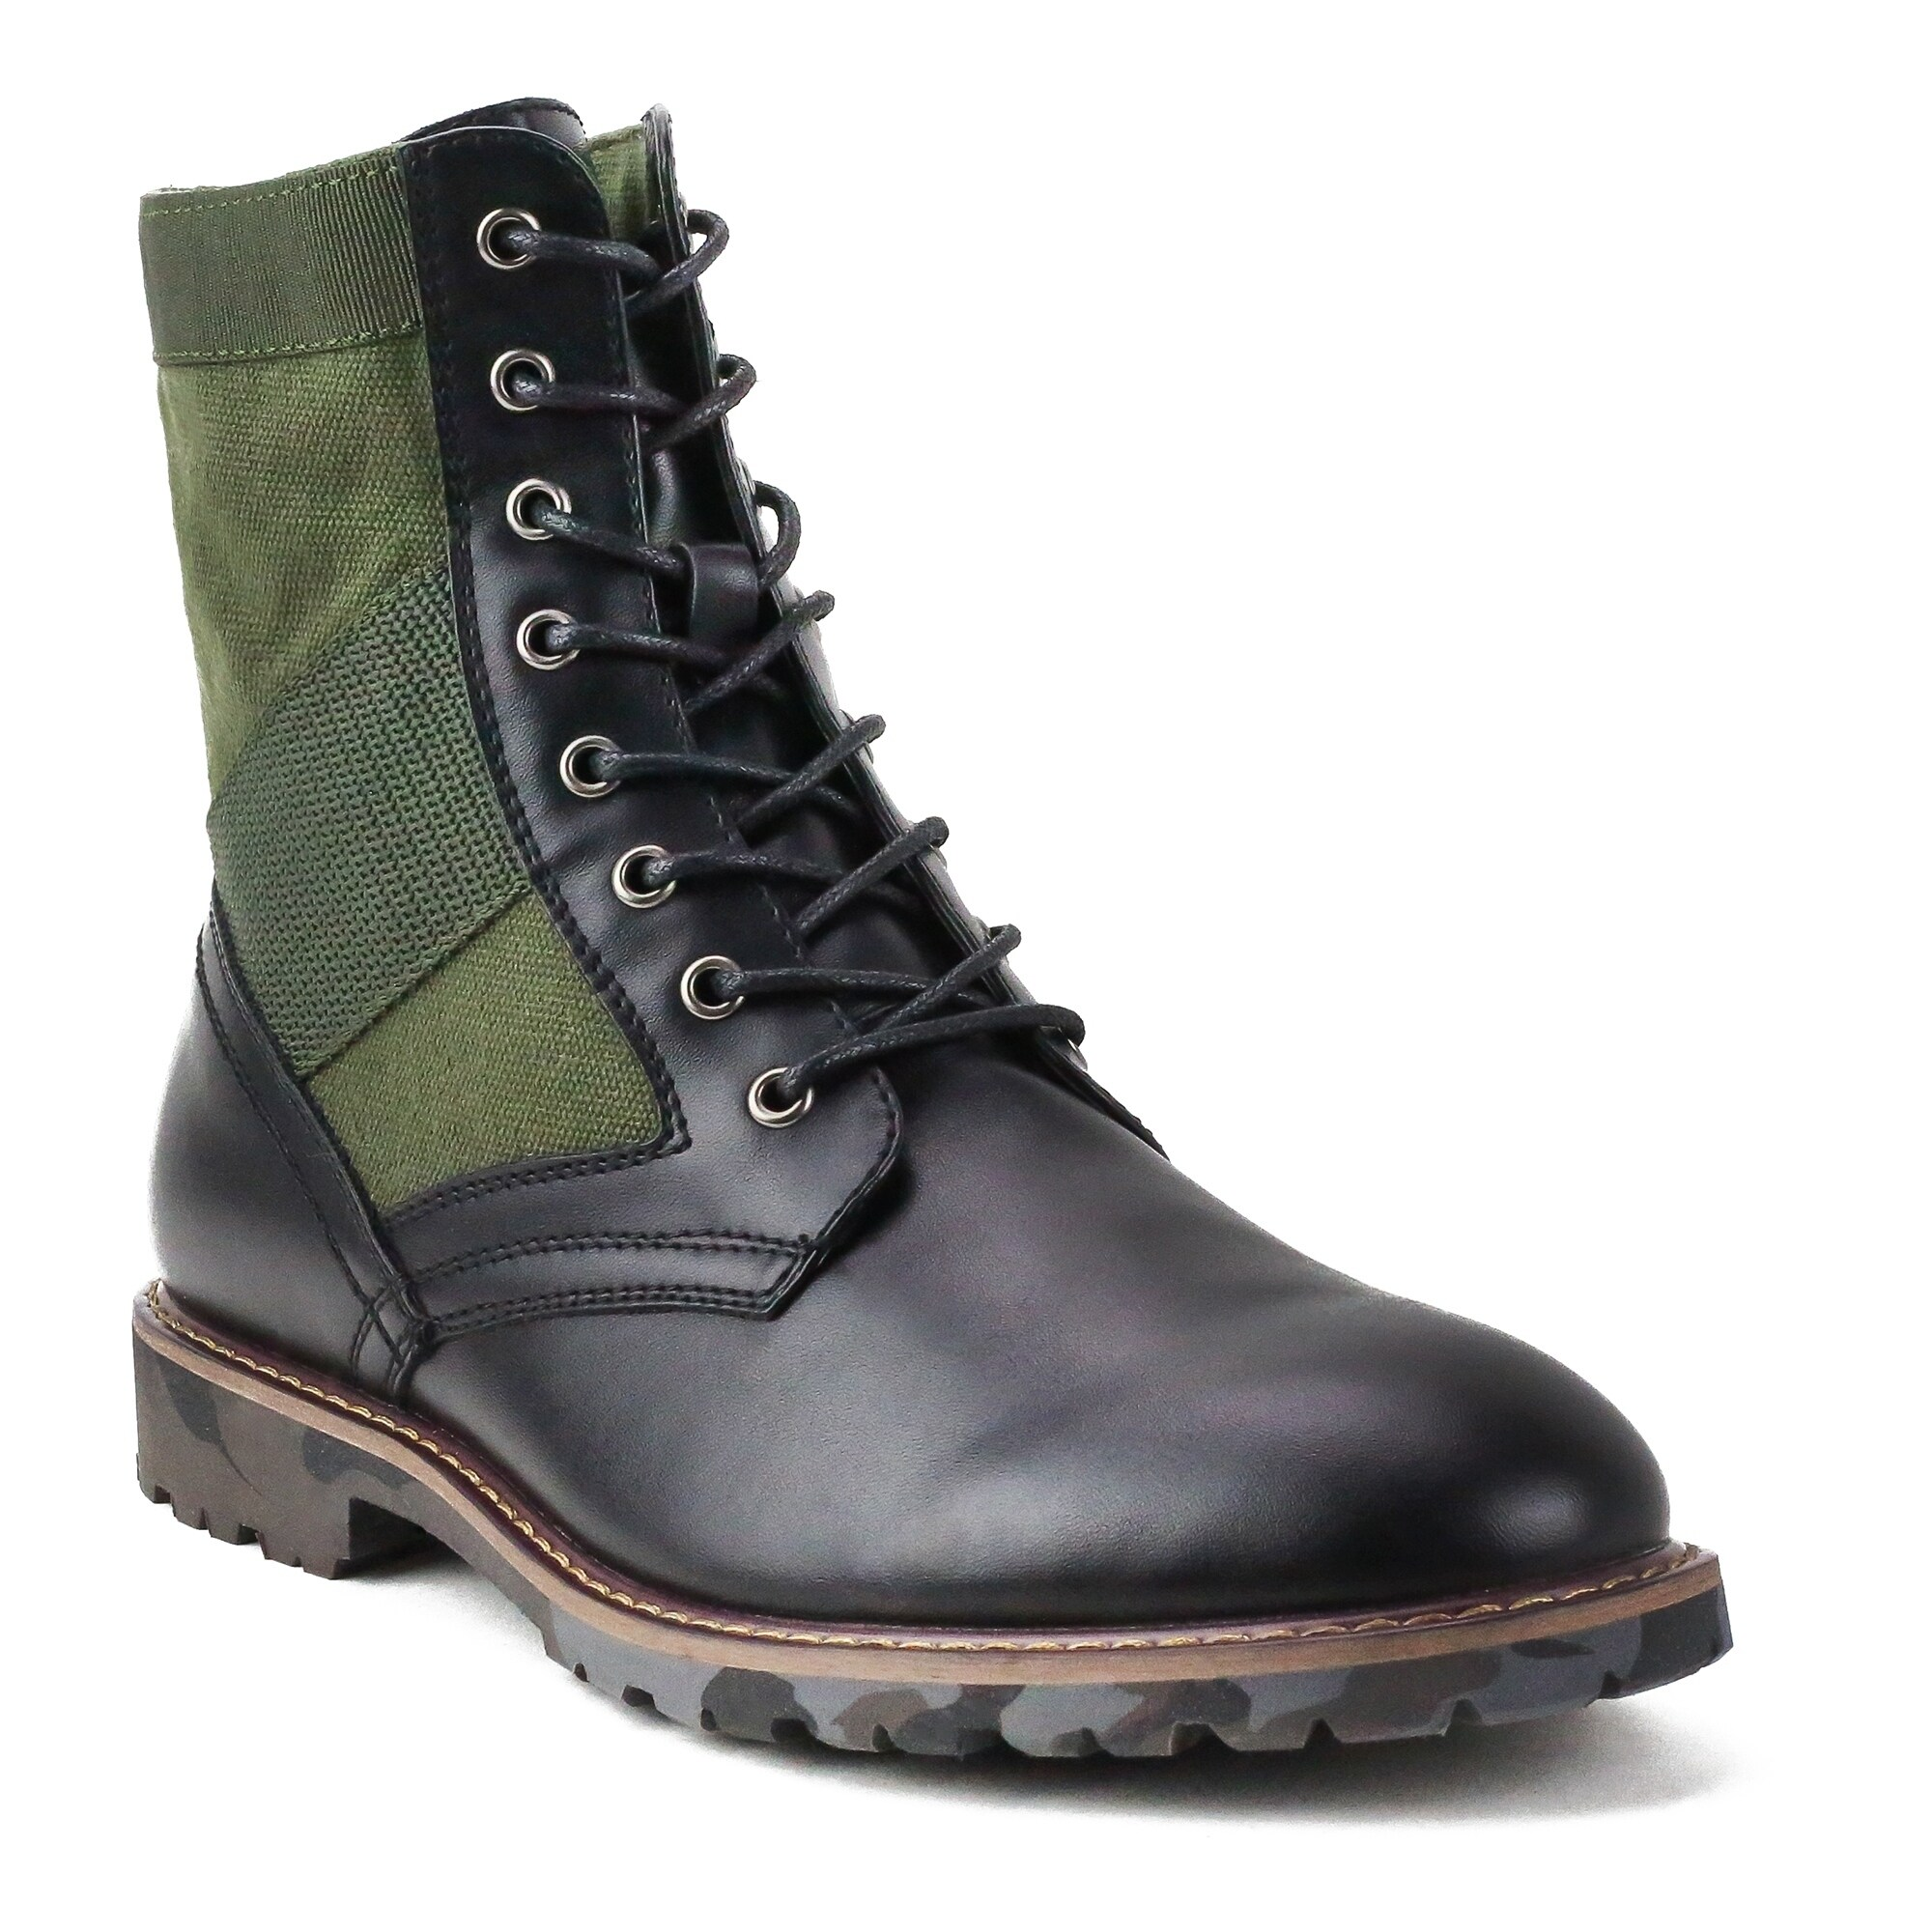 b6d149aa21 Buy Women's Boots Online at Overstock   Our Best Women's Shoes Deals